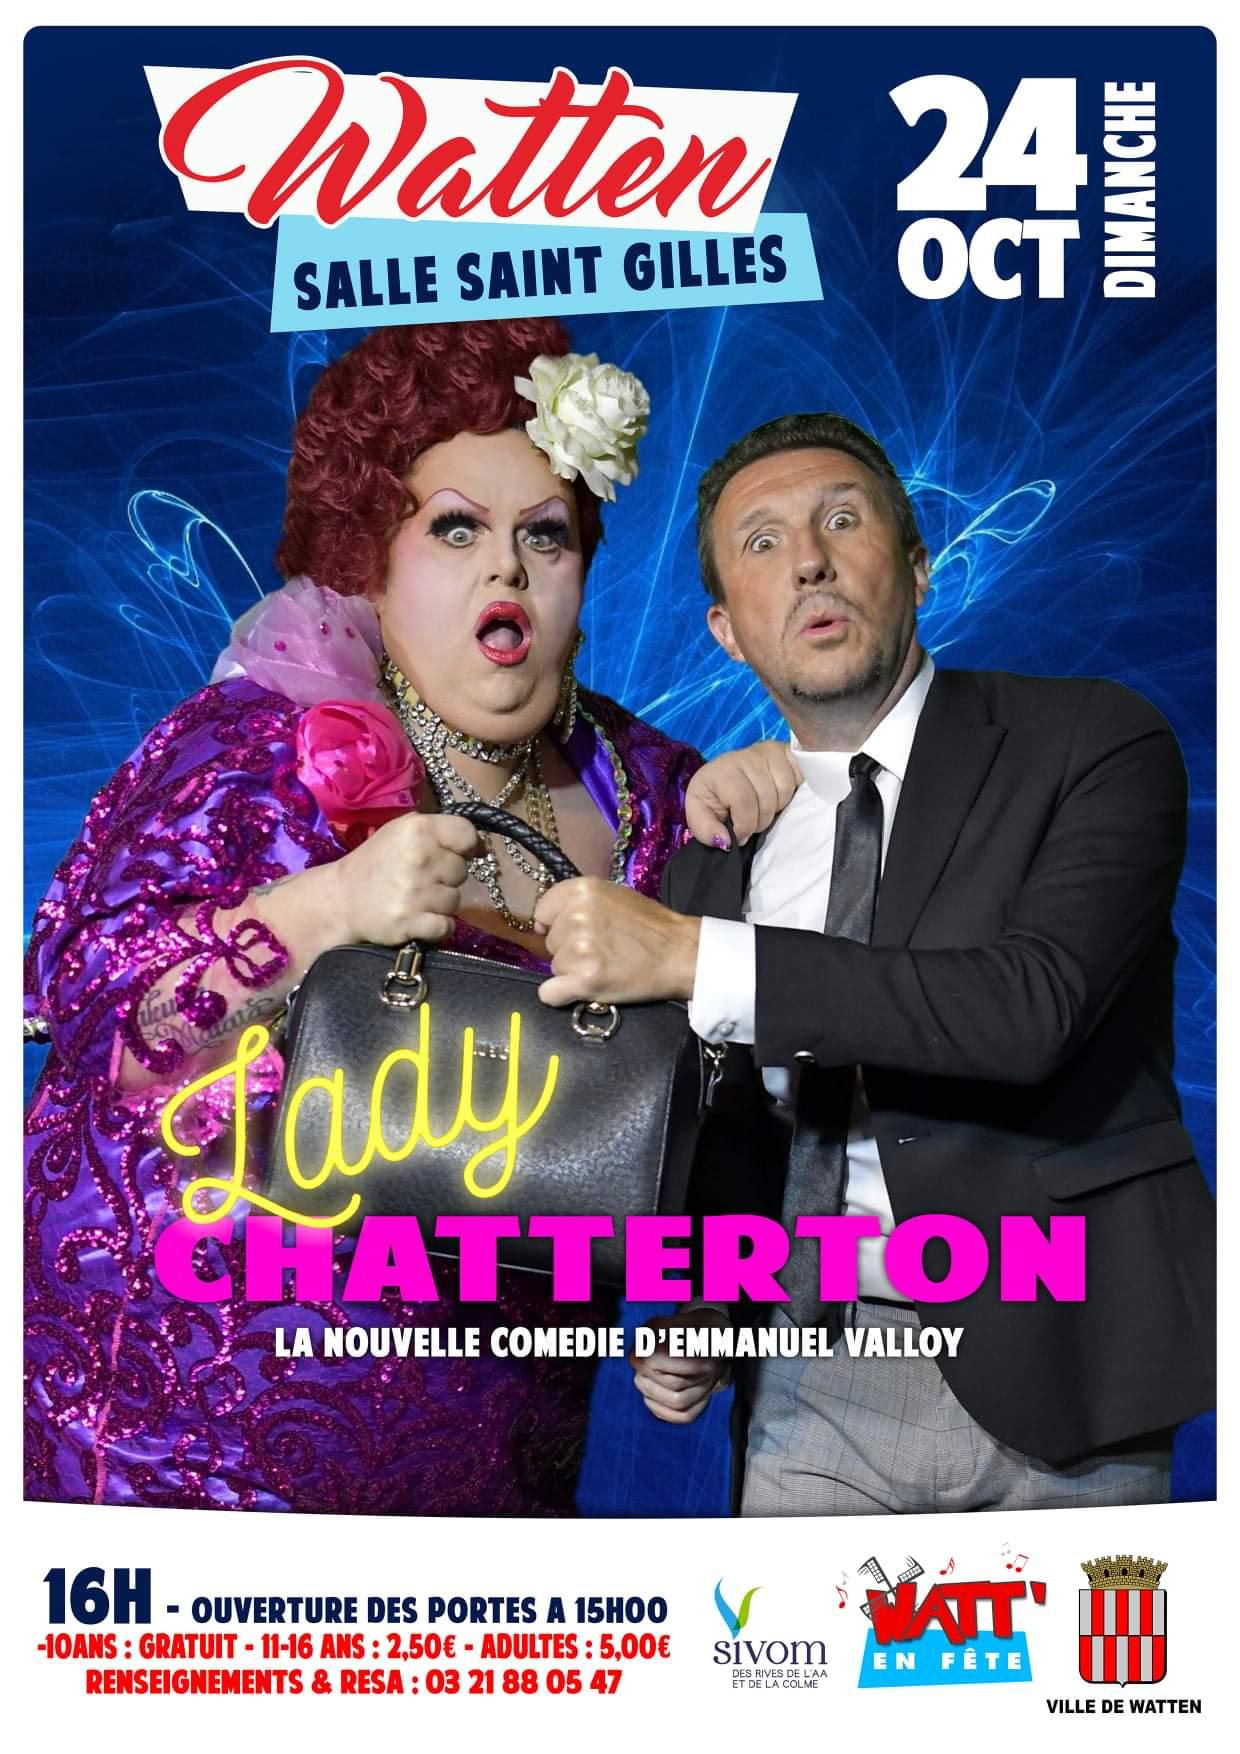 2021-10-24_lady_chatterton_les_insolites_watten.jpg